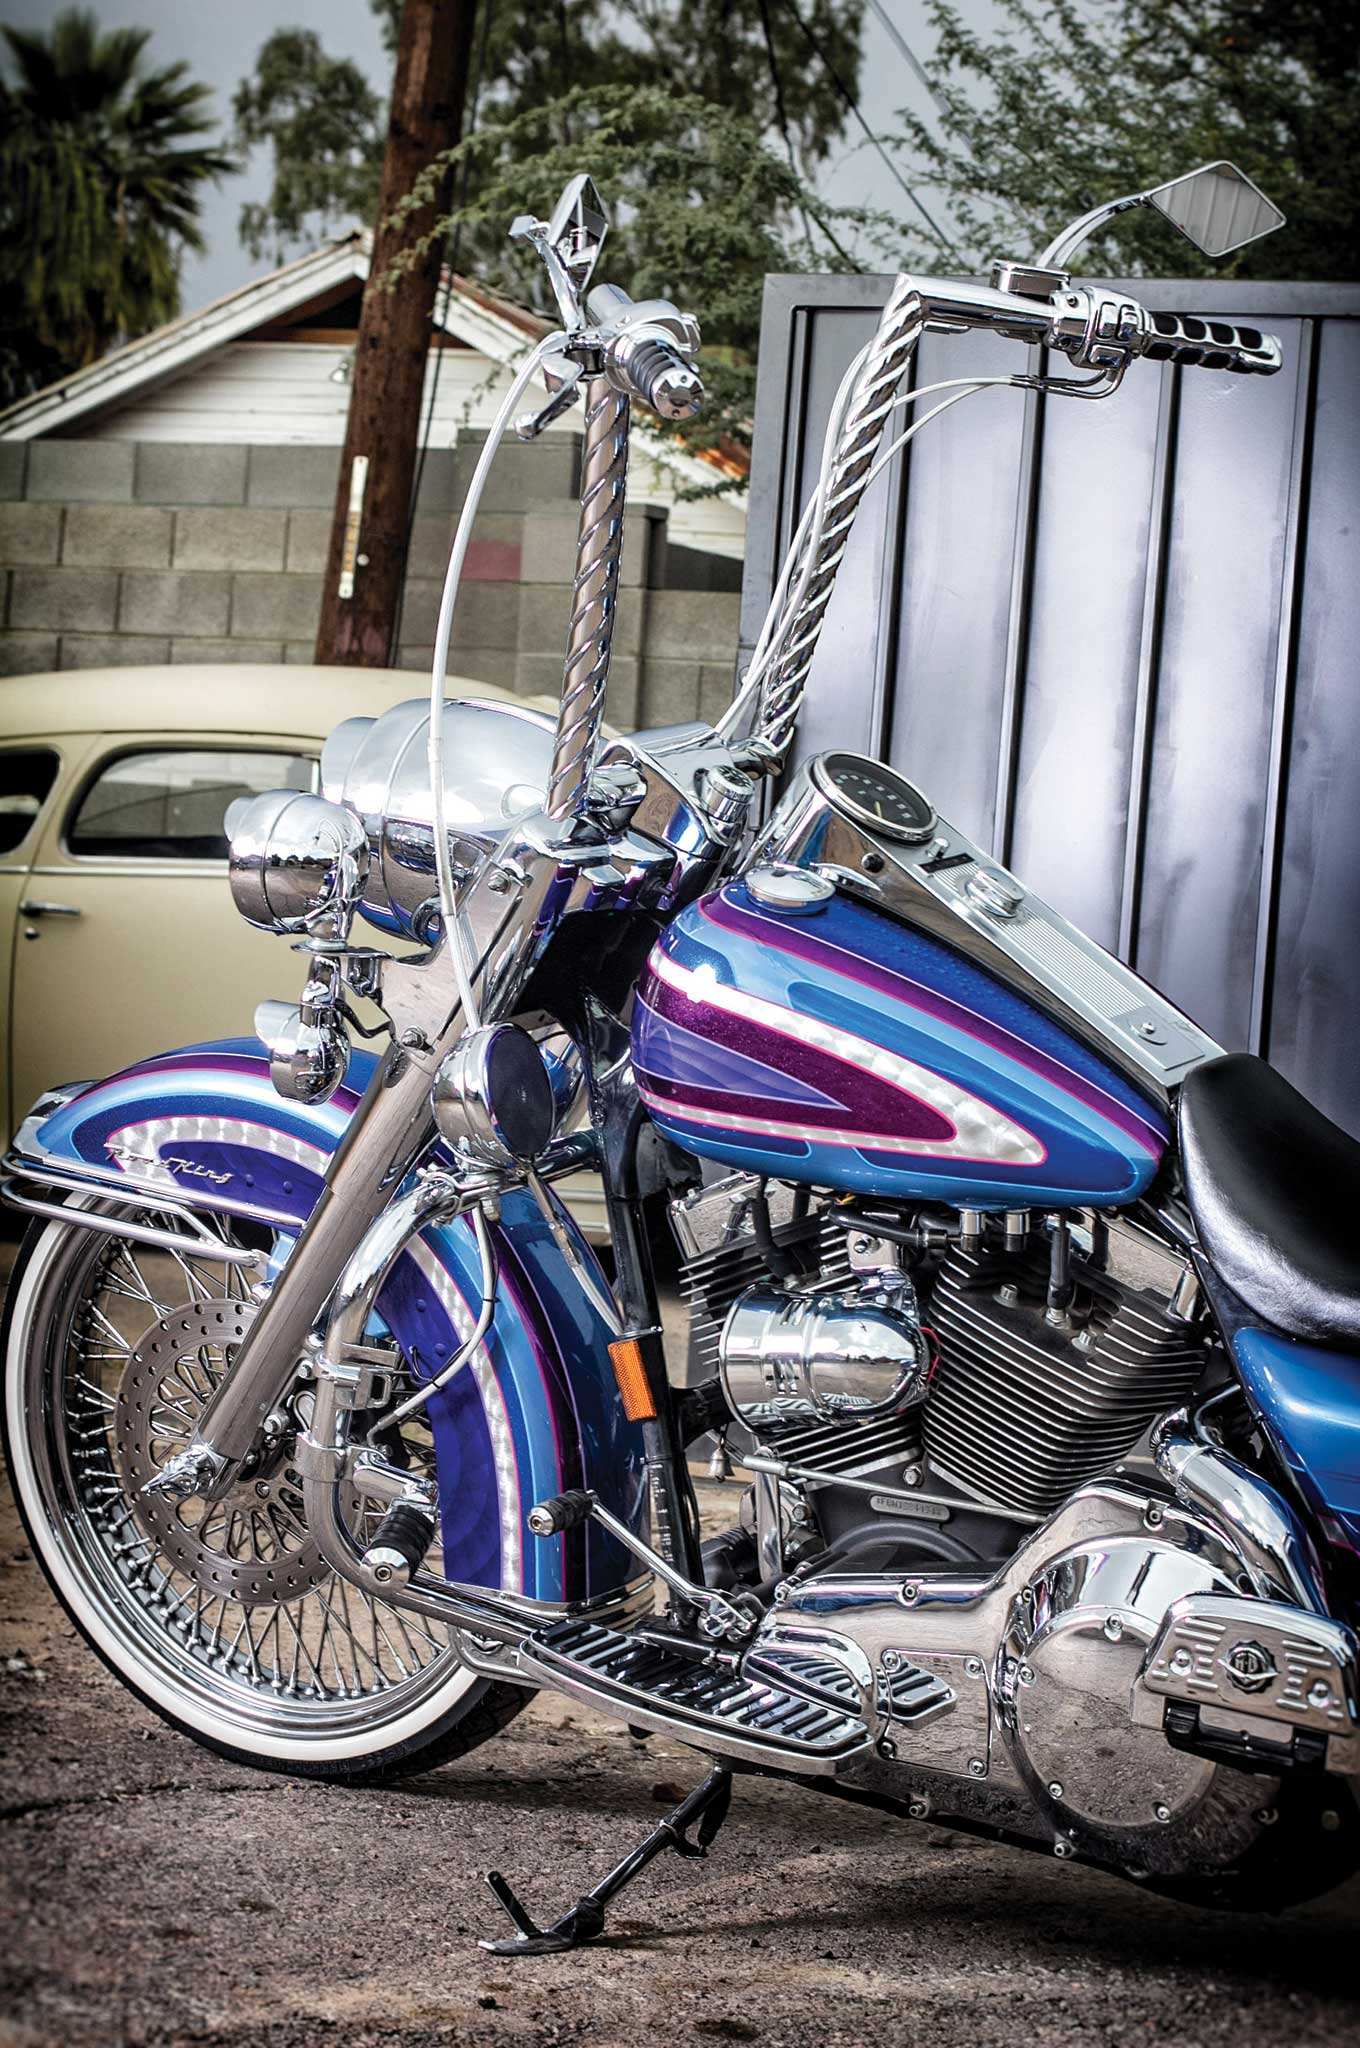 2001 Harley Davidson Road King Old Habits Die Hard